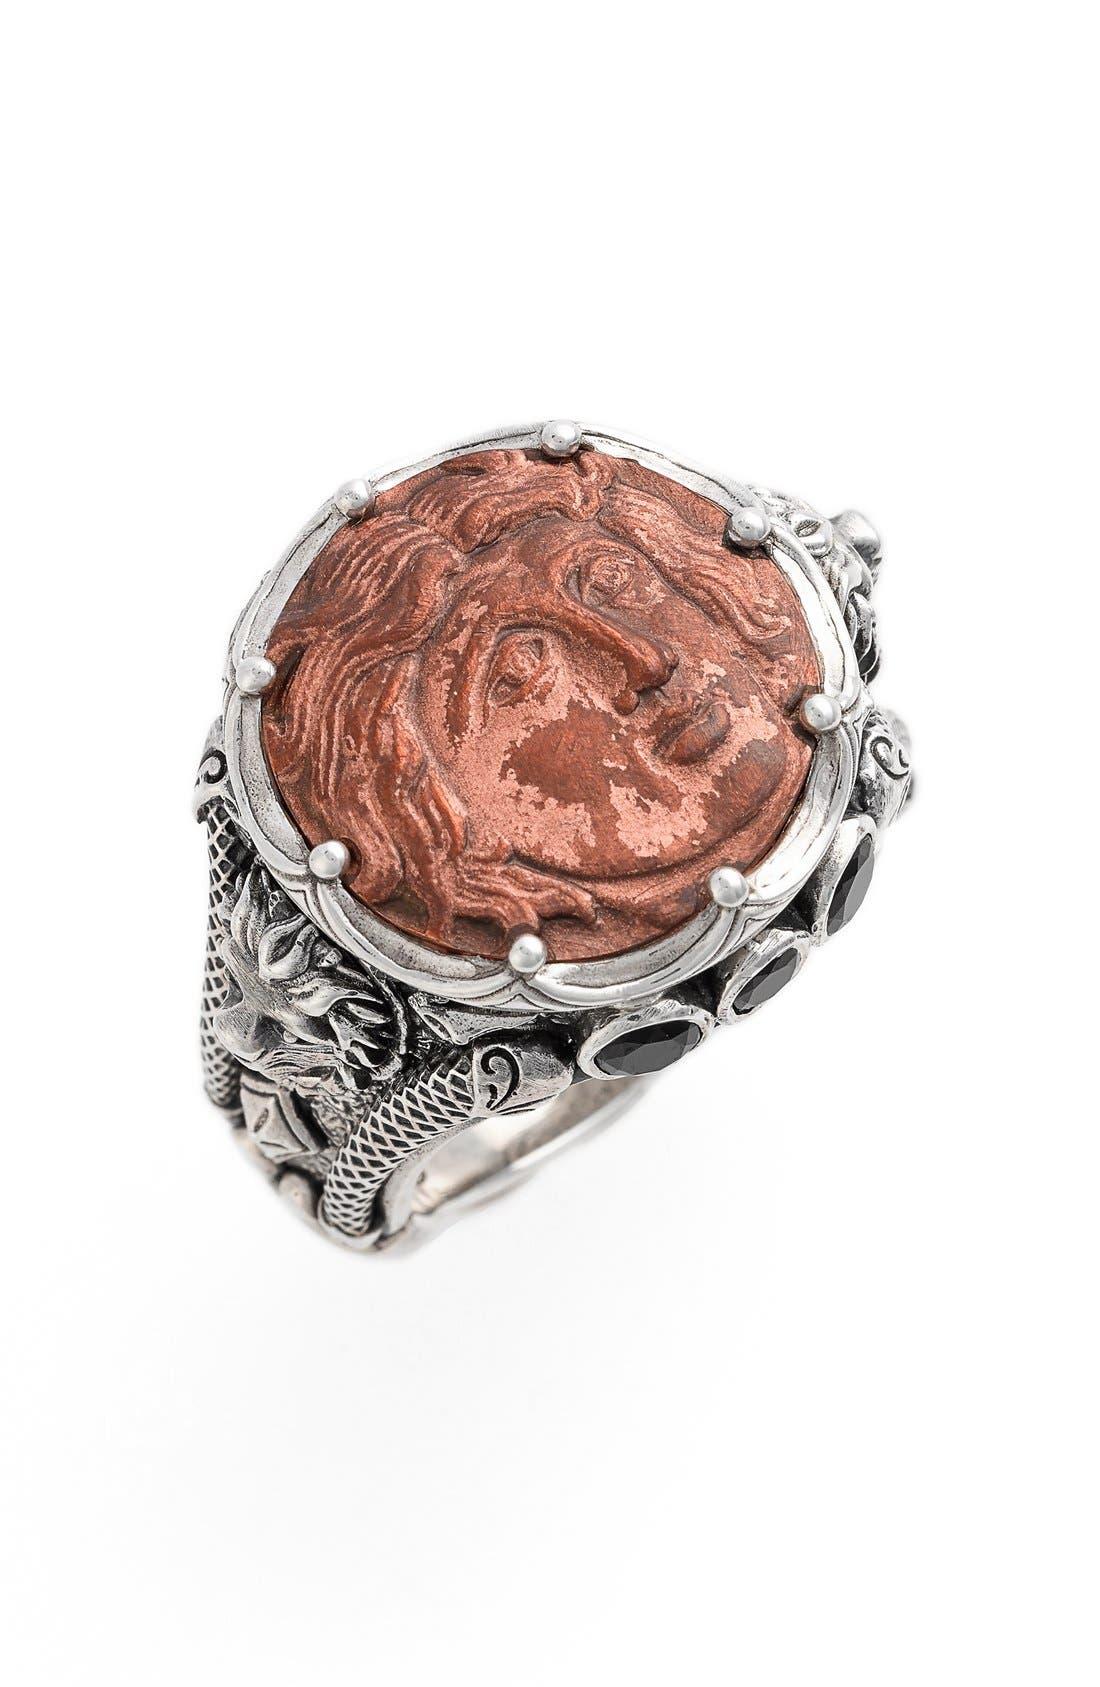 'Aeolous' Greek Coin Ring,                             Main thumbnail 1, color,                             COPPER/ SILVER